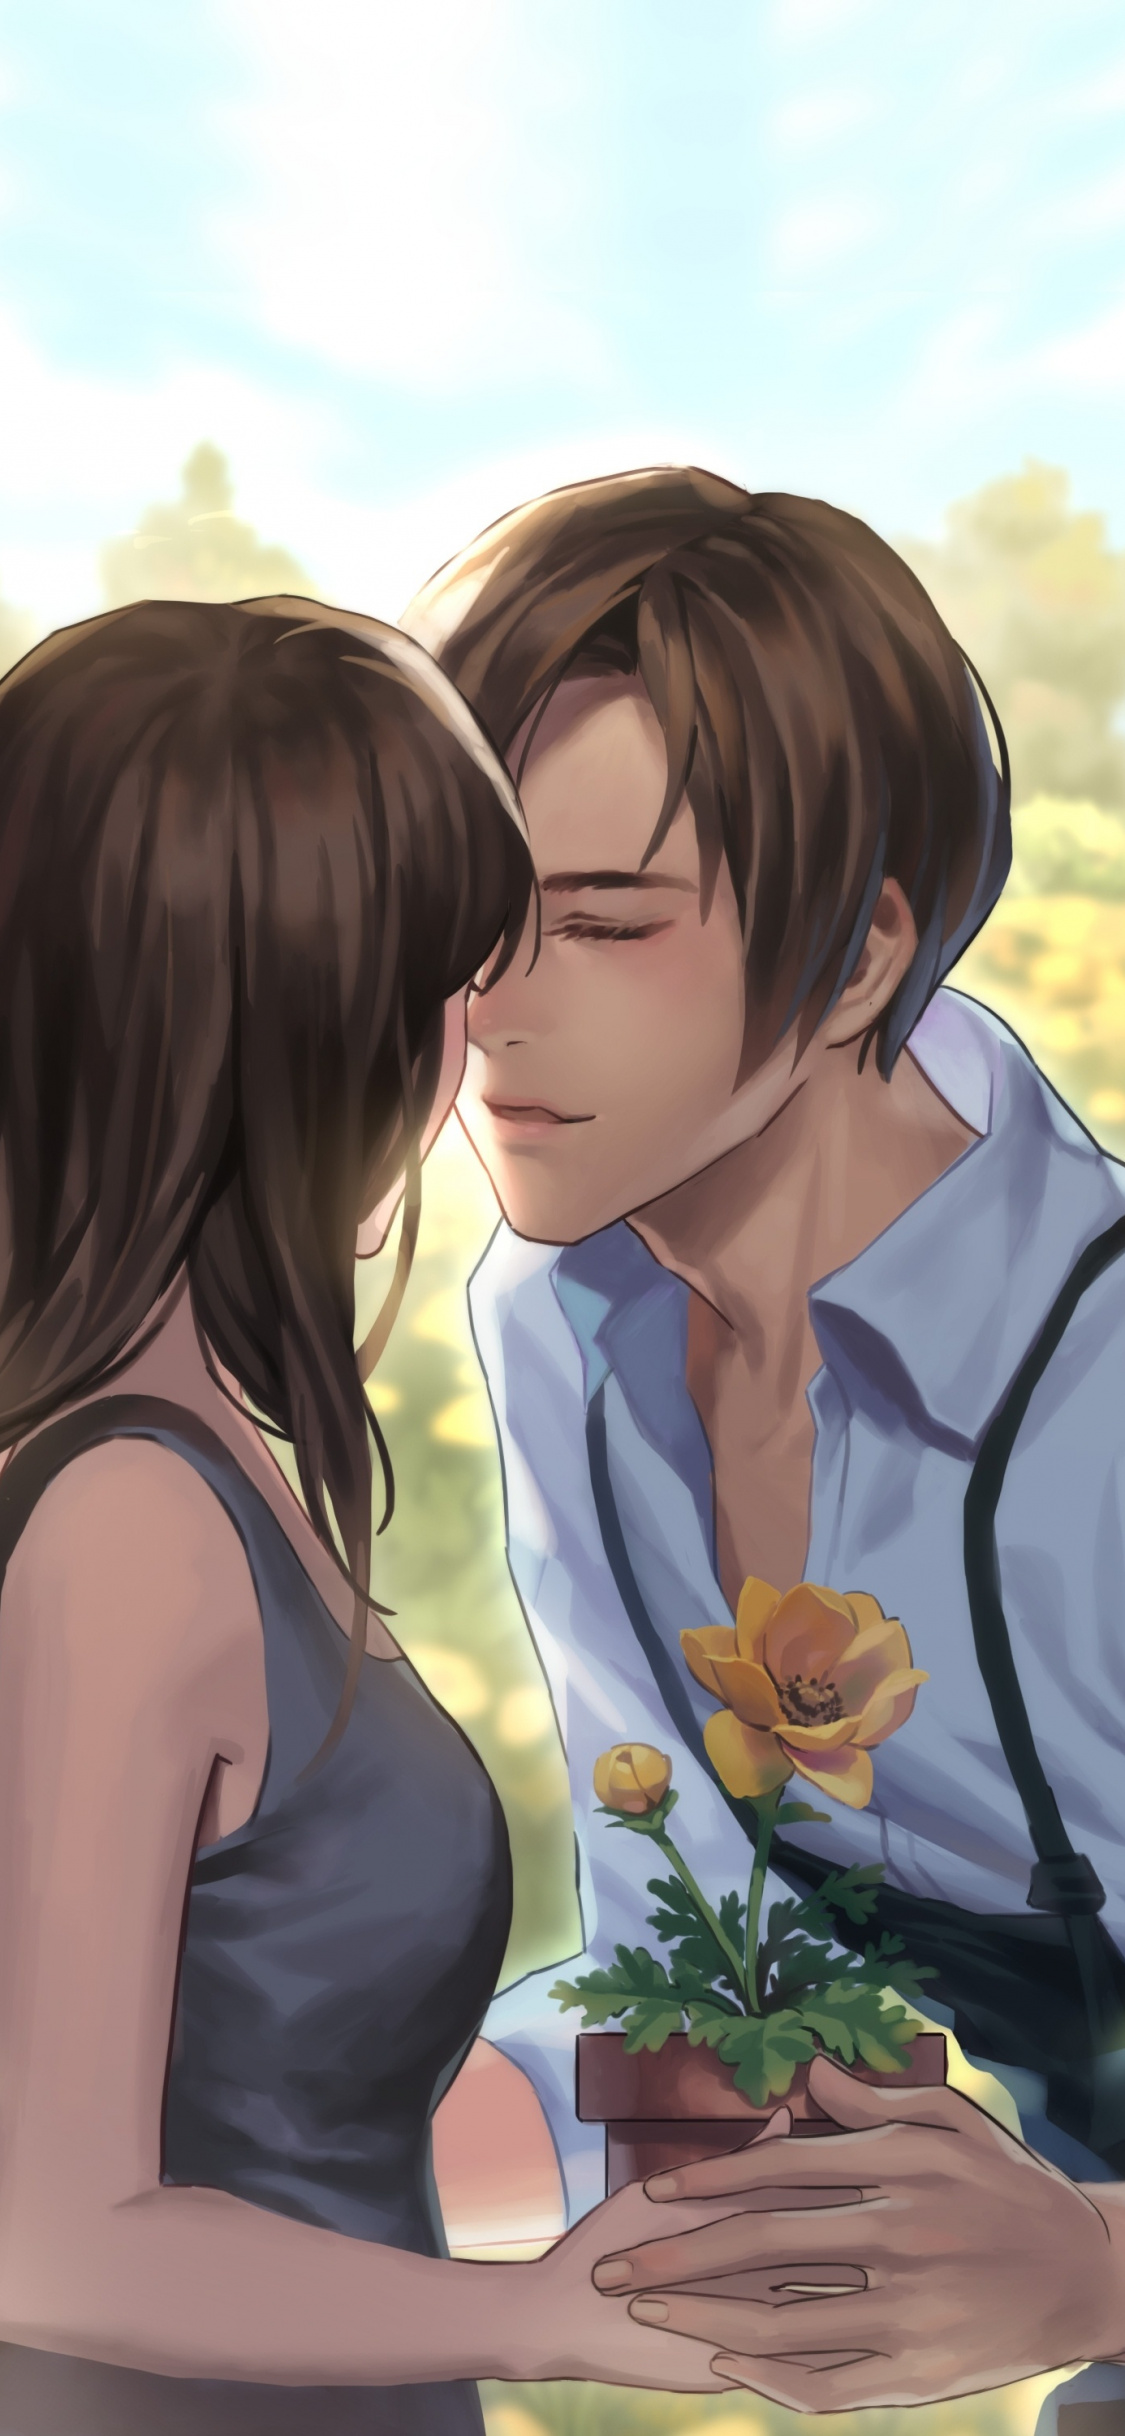 Romantic Couple Meadow Love Art Wallpaper Romantic Couple Couple Hd 1125x2436 Wallpaper Teahub Io